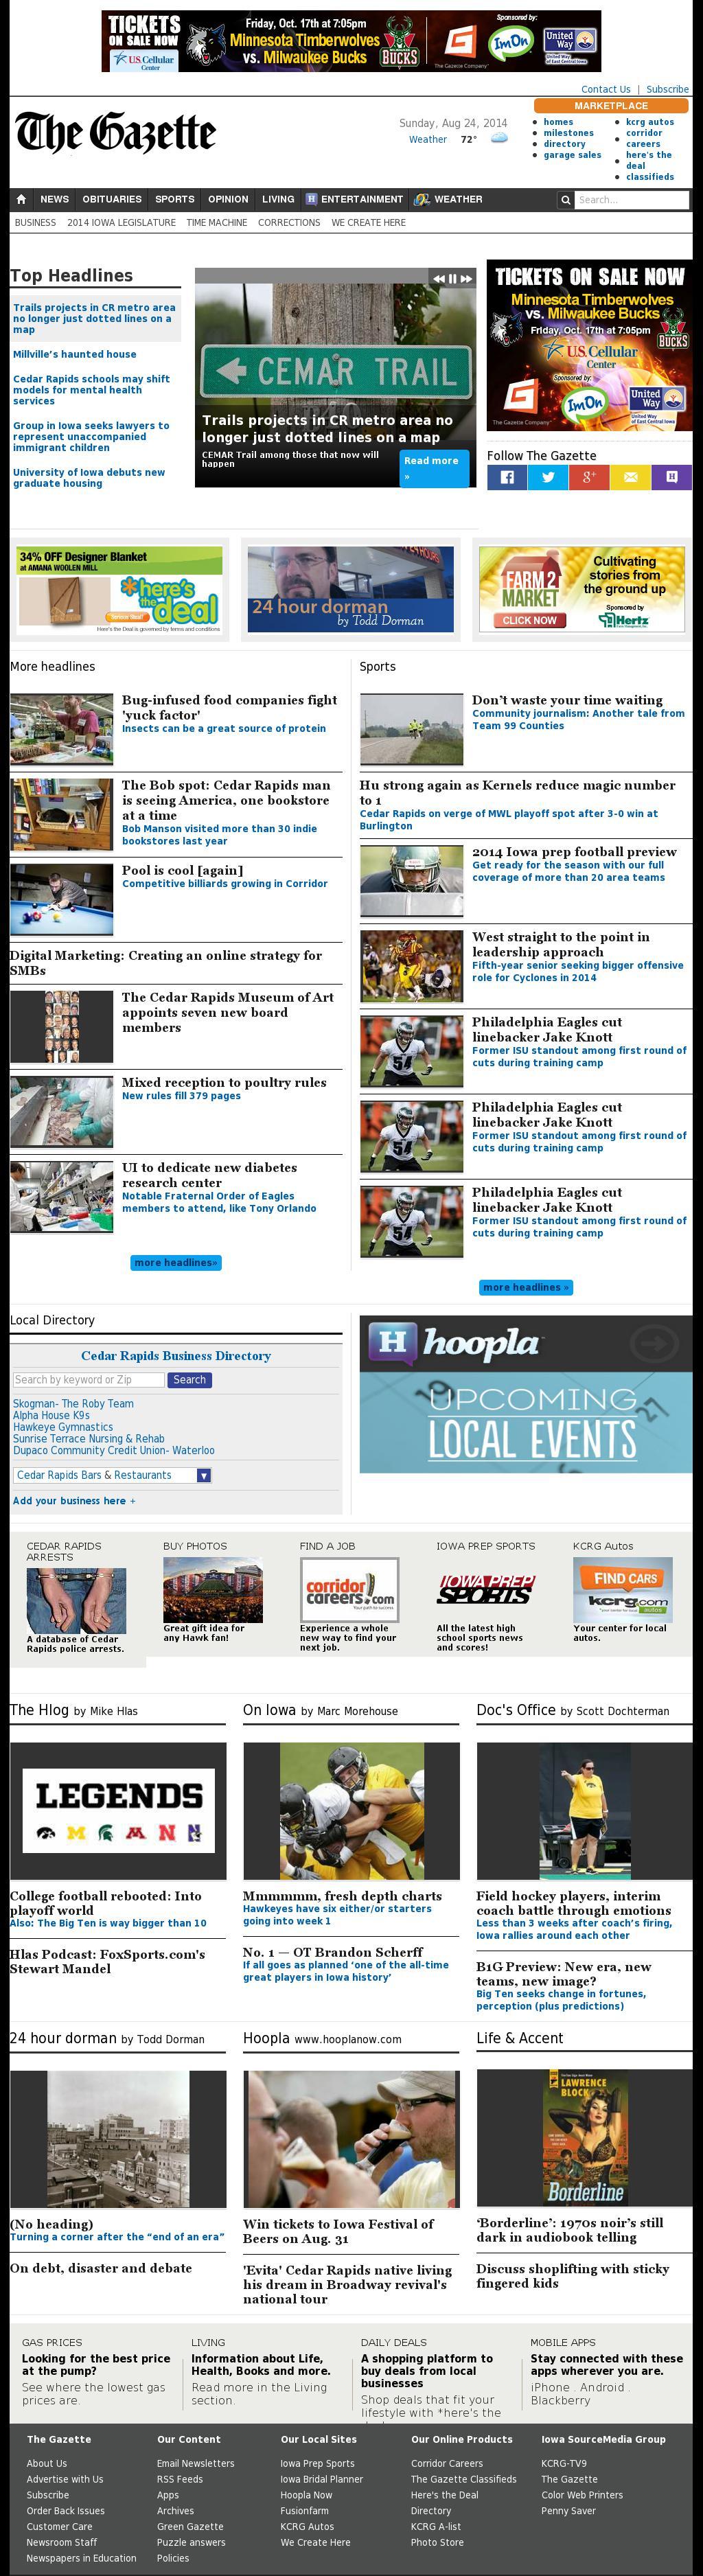 The (Cedar Rapids) Gazette at Sunday Aug. 24, 2014, 2:07 p.m. UTC